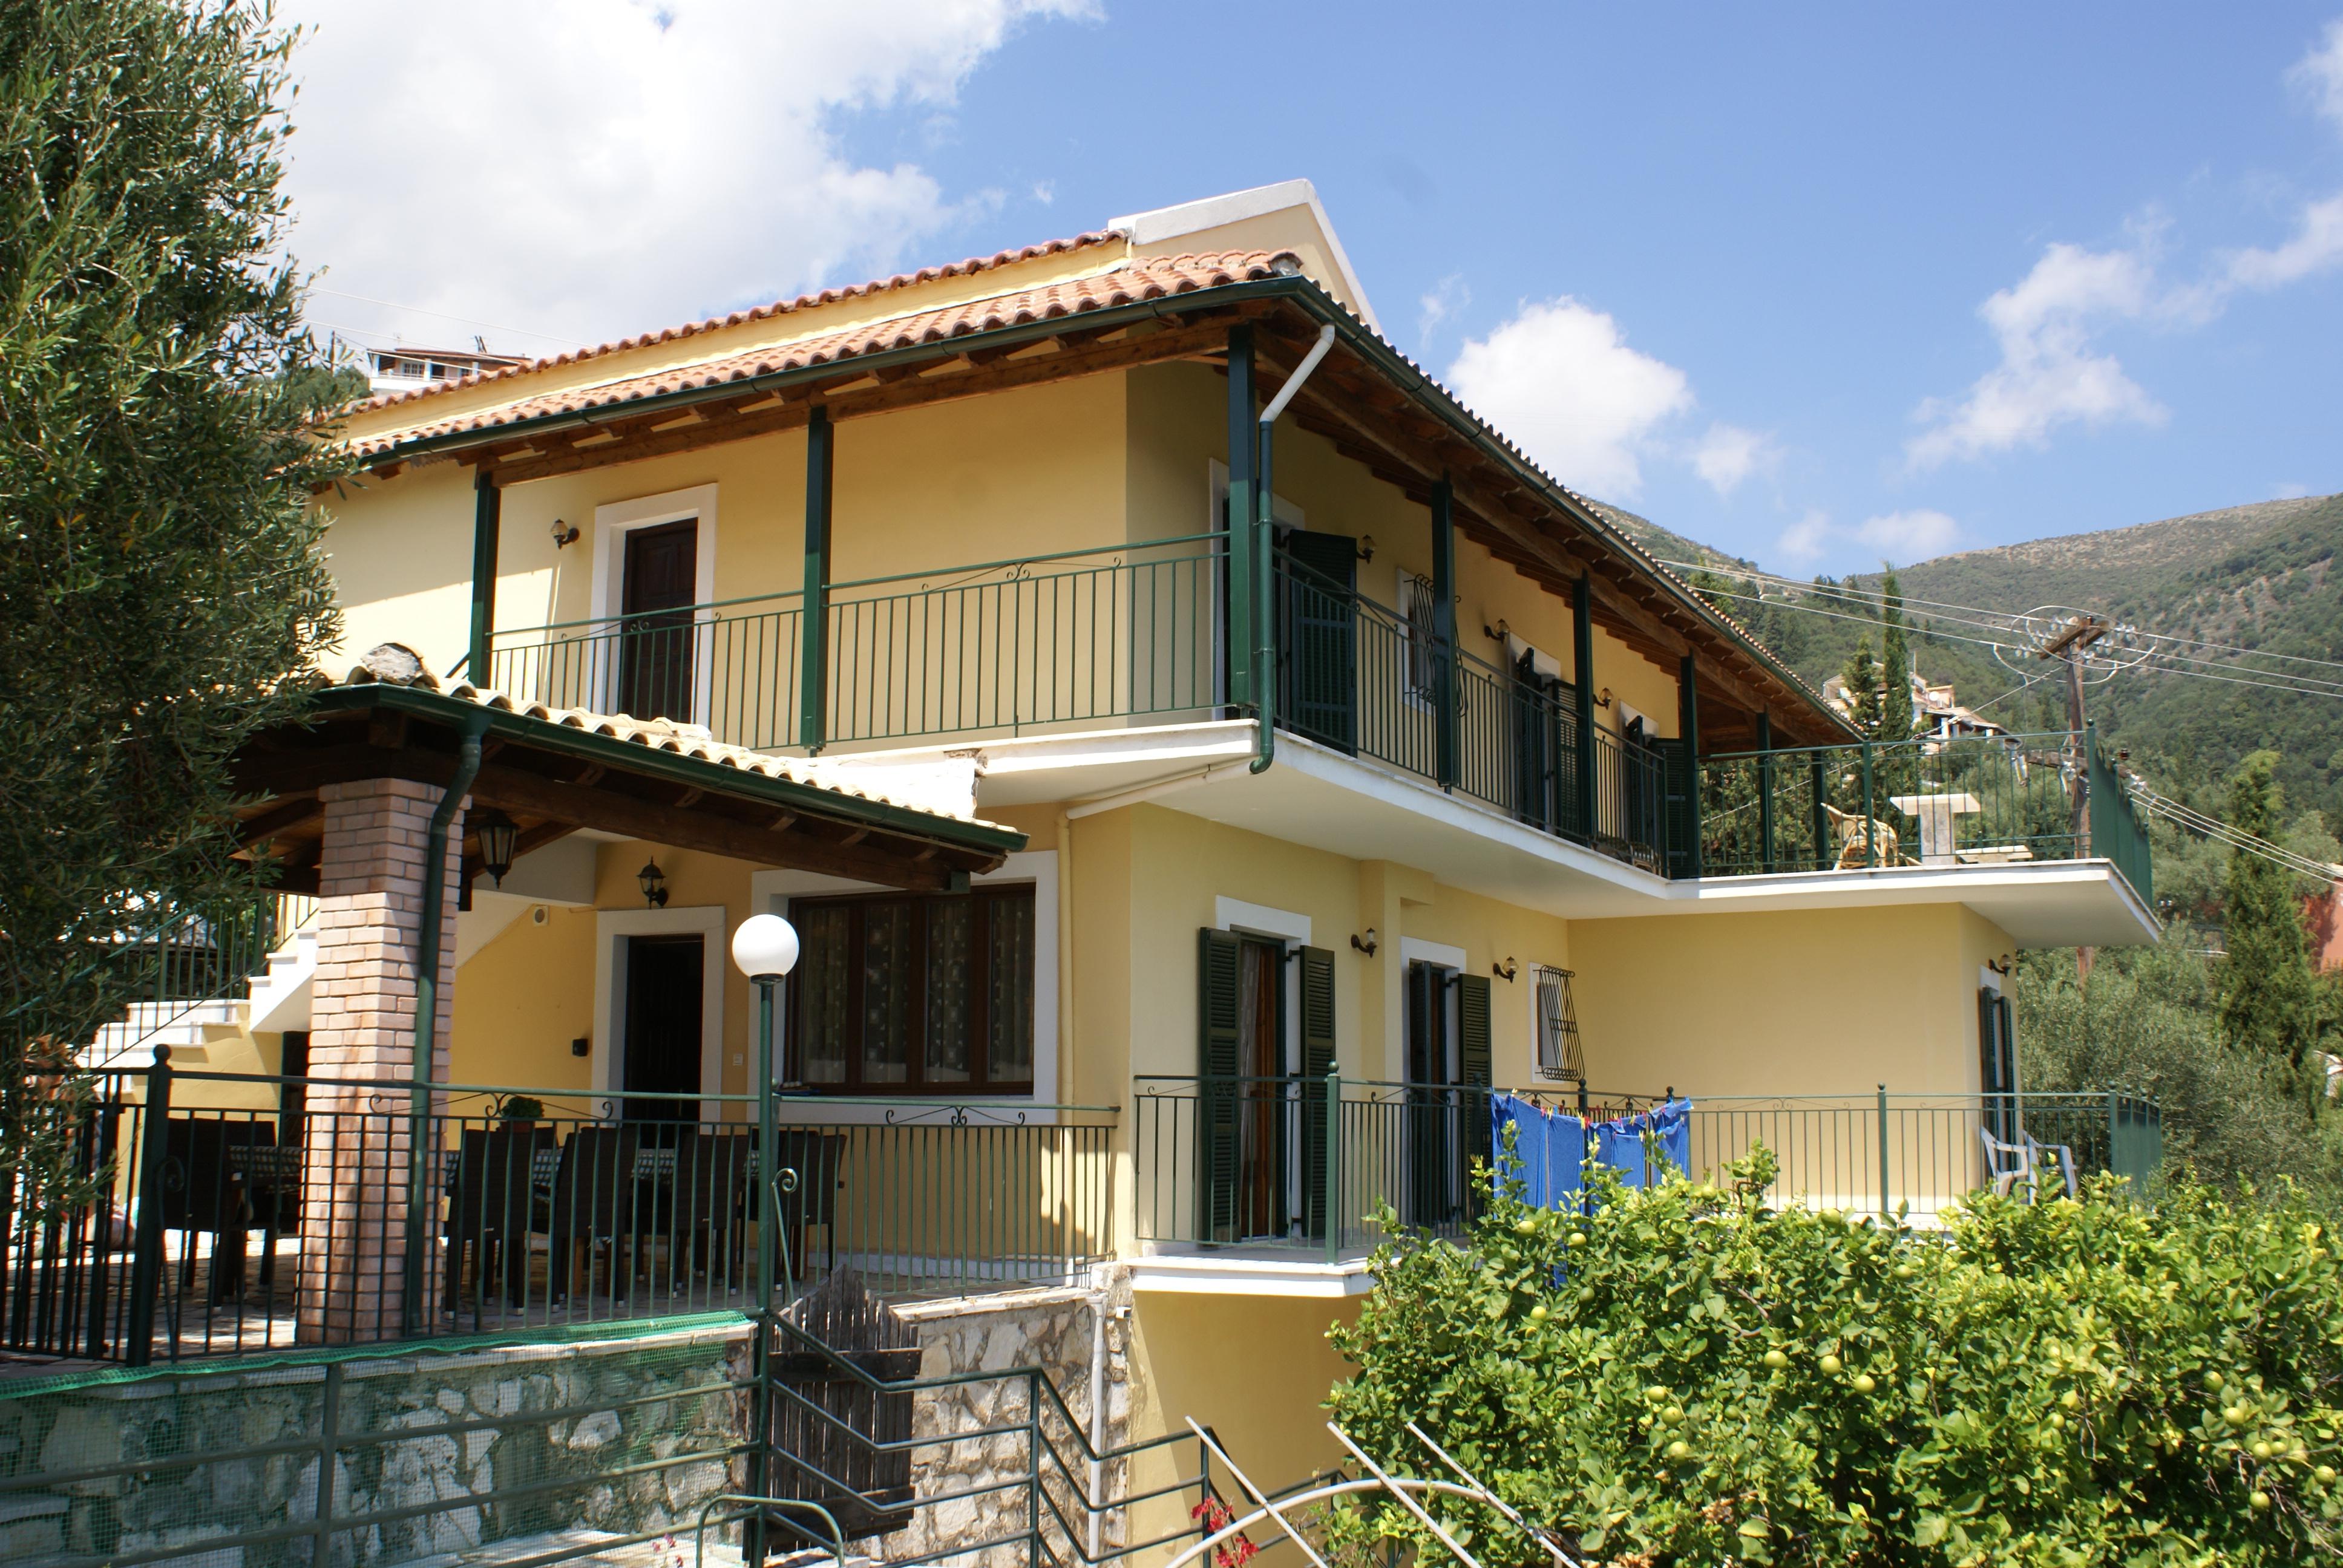 Aussenansicht - Balkon - Korfu Ferienhaus Villa Adonis mit Pool, Nissaki, KorfuCorfu.de